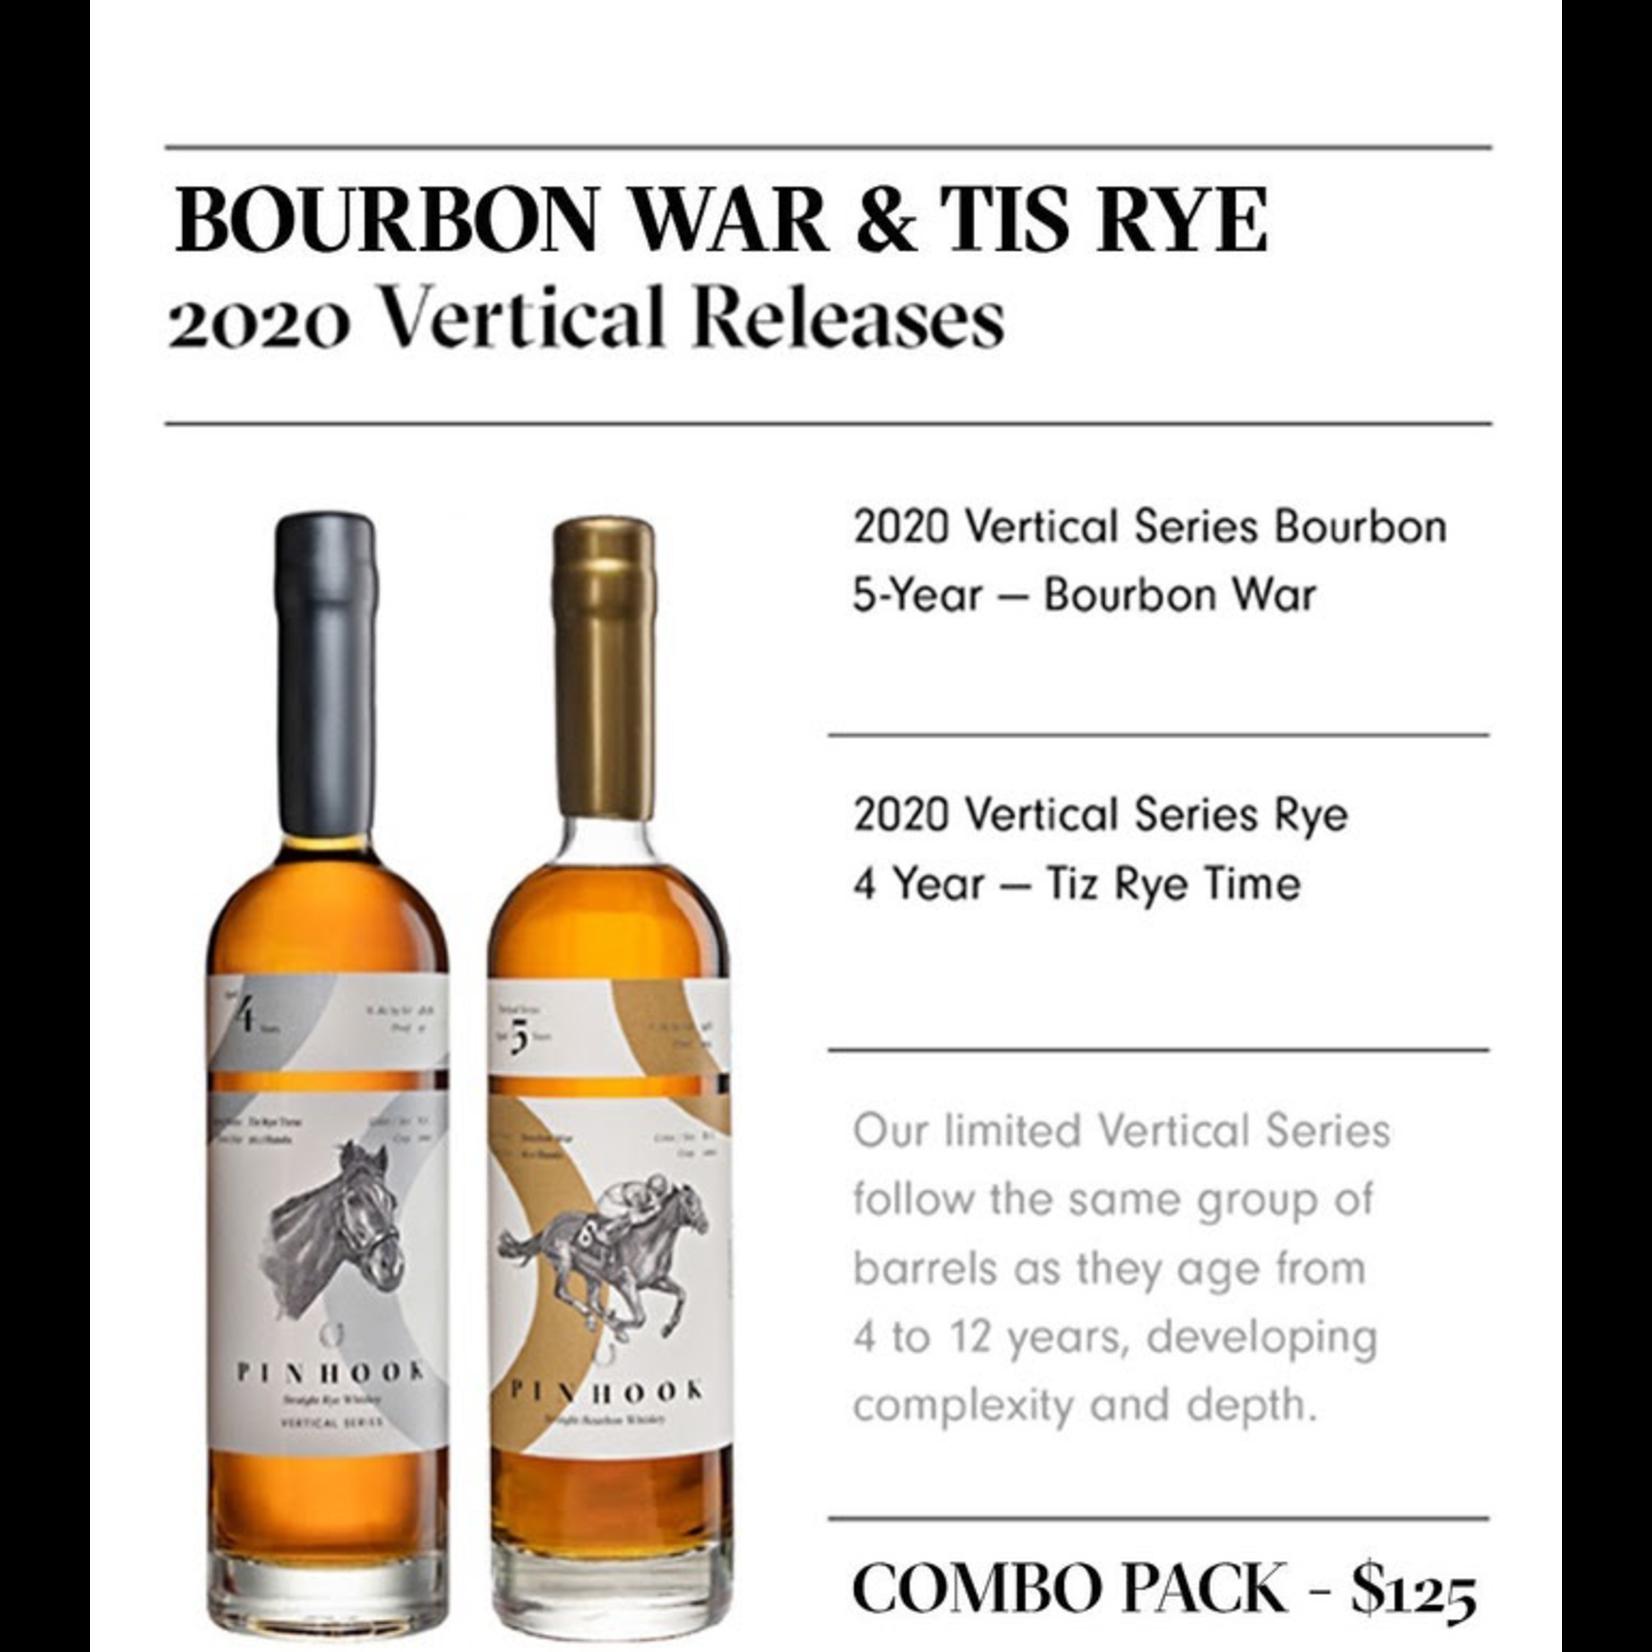 Spirits Pinhook Vertical Releases Bourbon War & Tis Rye Combo Pack